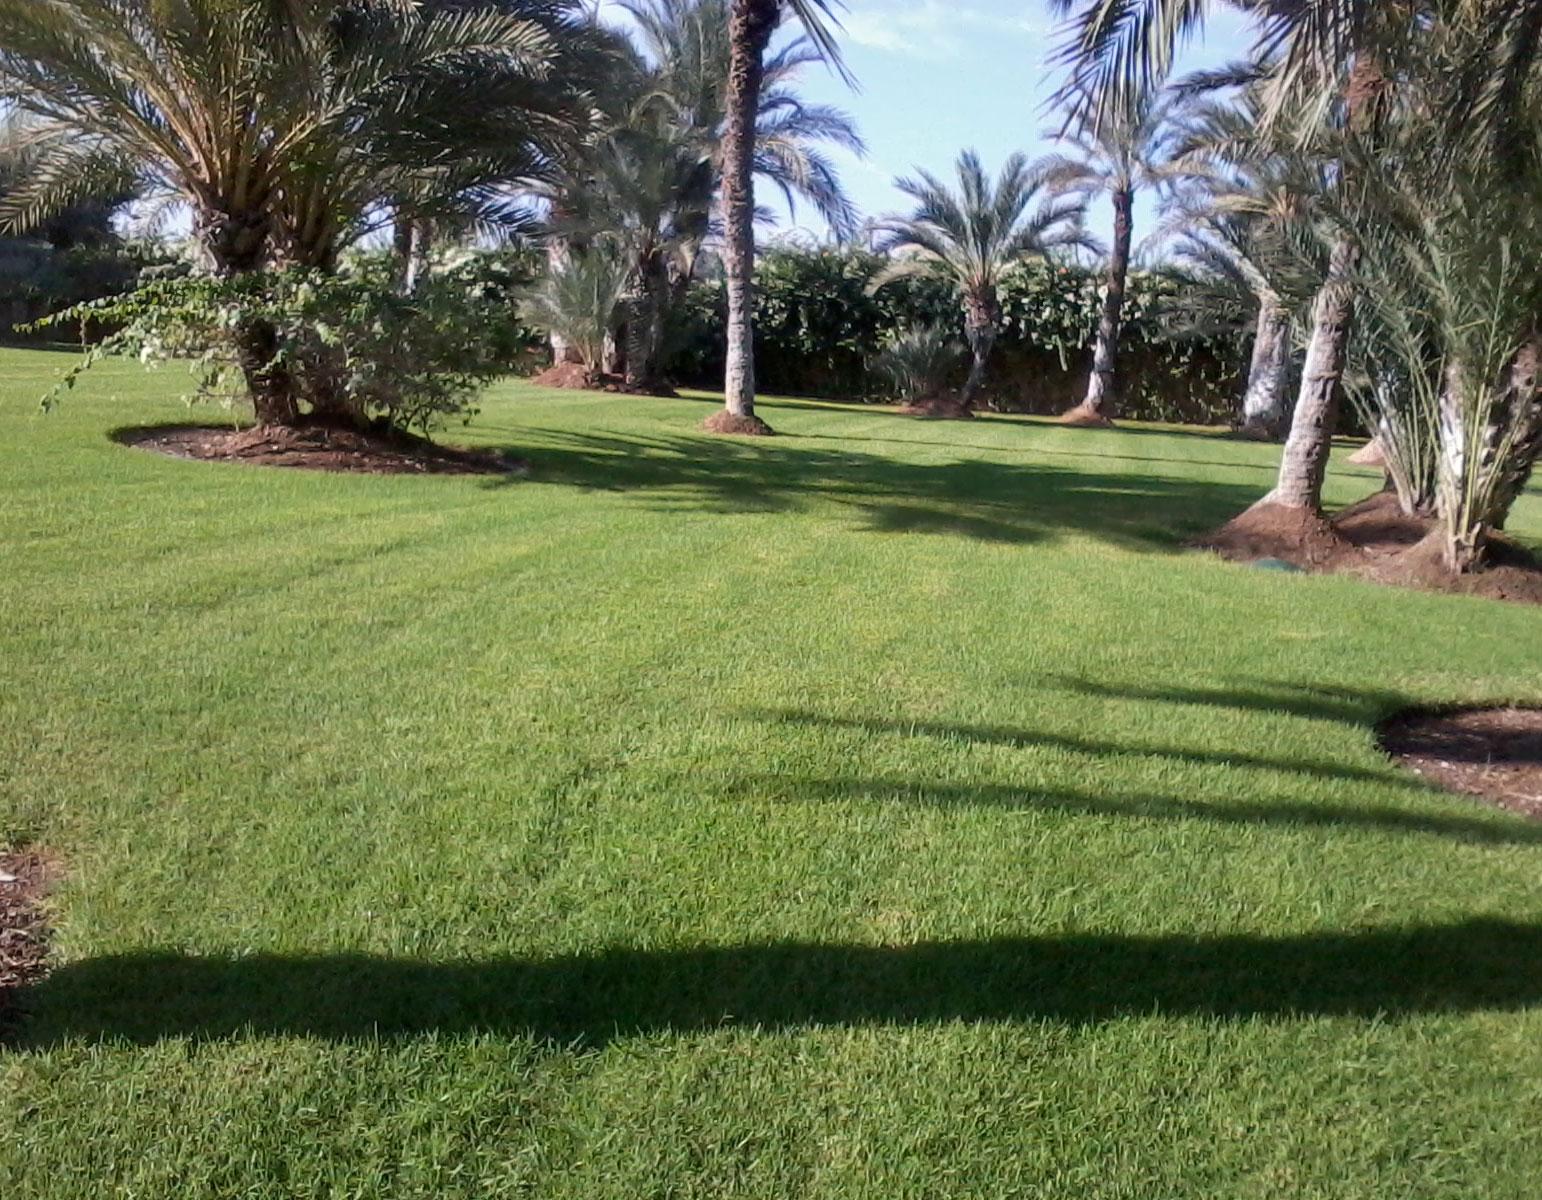 Entretien des espaces verts à Marrakech Maroc || Maintenance of green areas in Marrakech Morocco